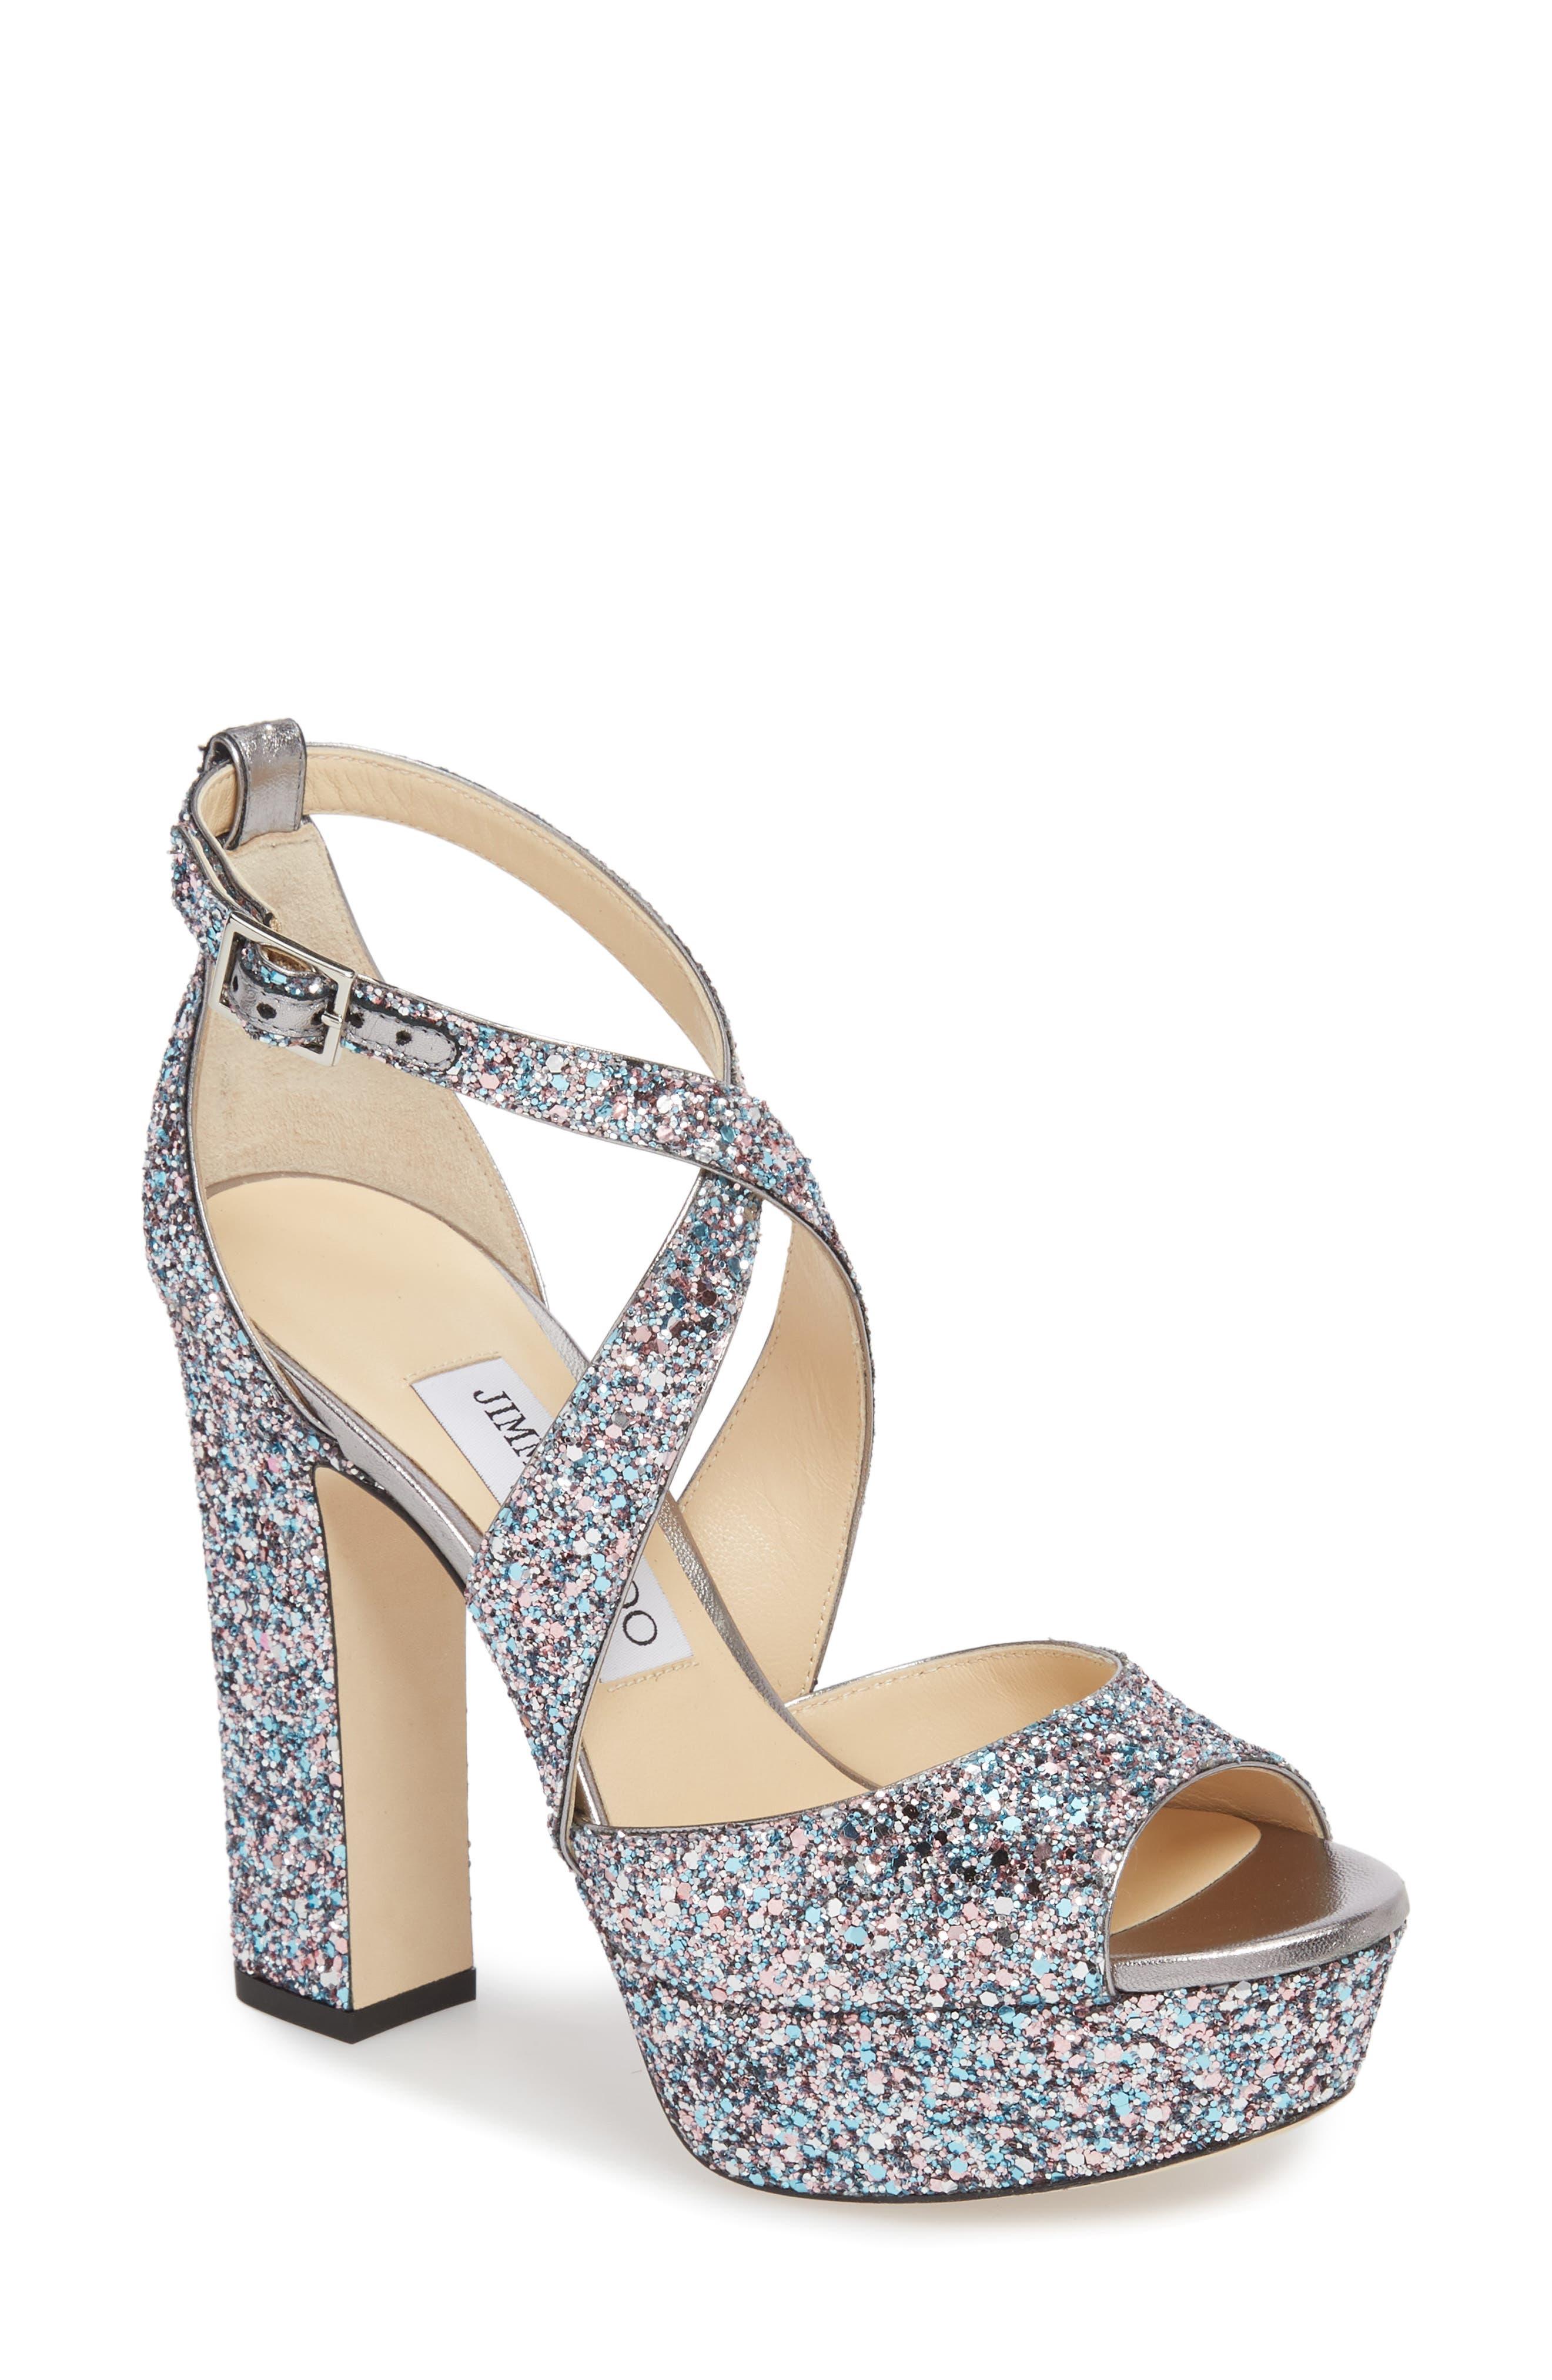 Jimmy choo Women's April Glitter Platform Sandal PsmWVDr